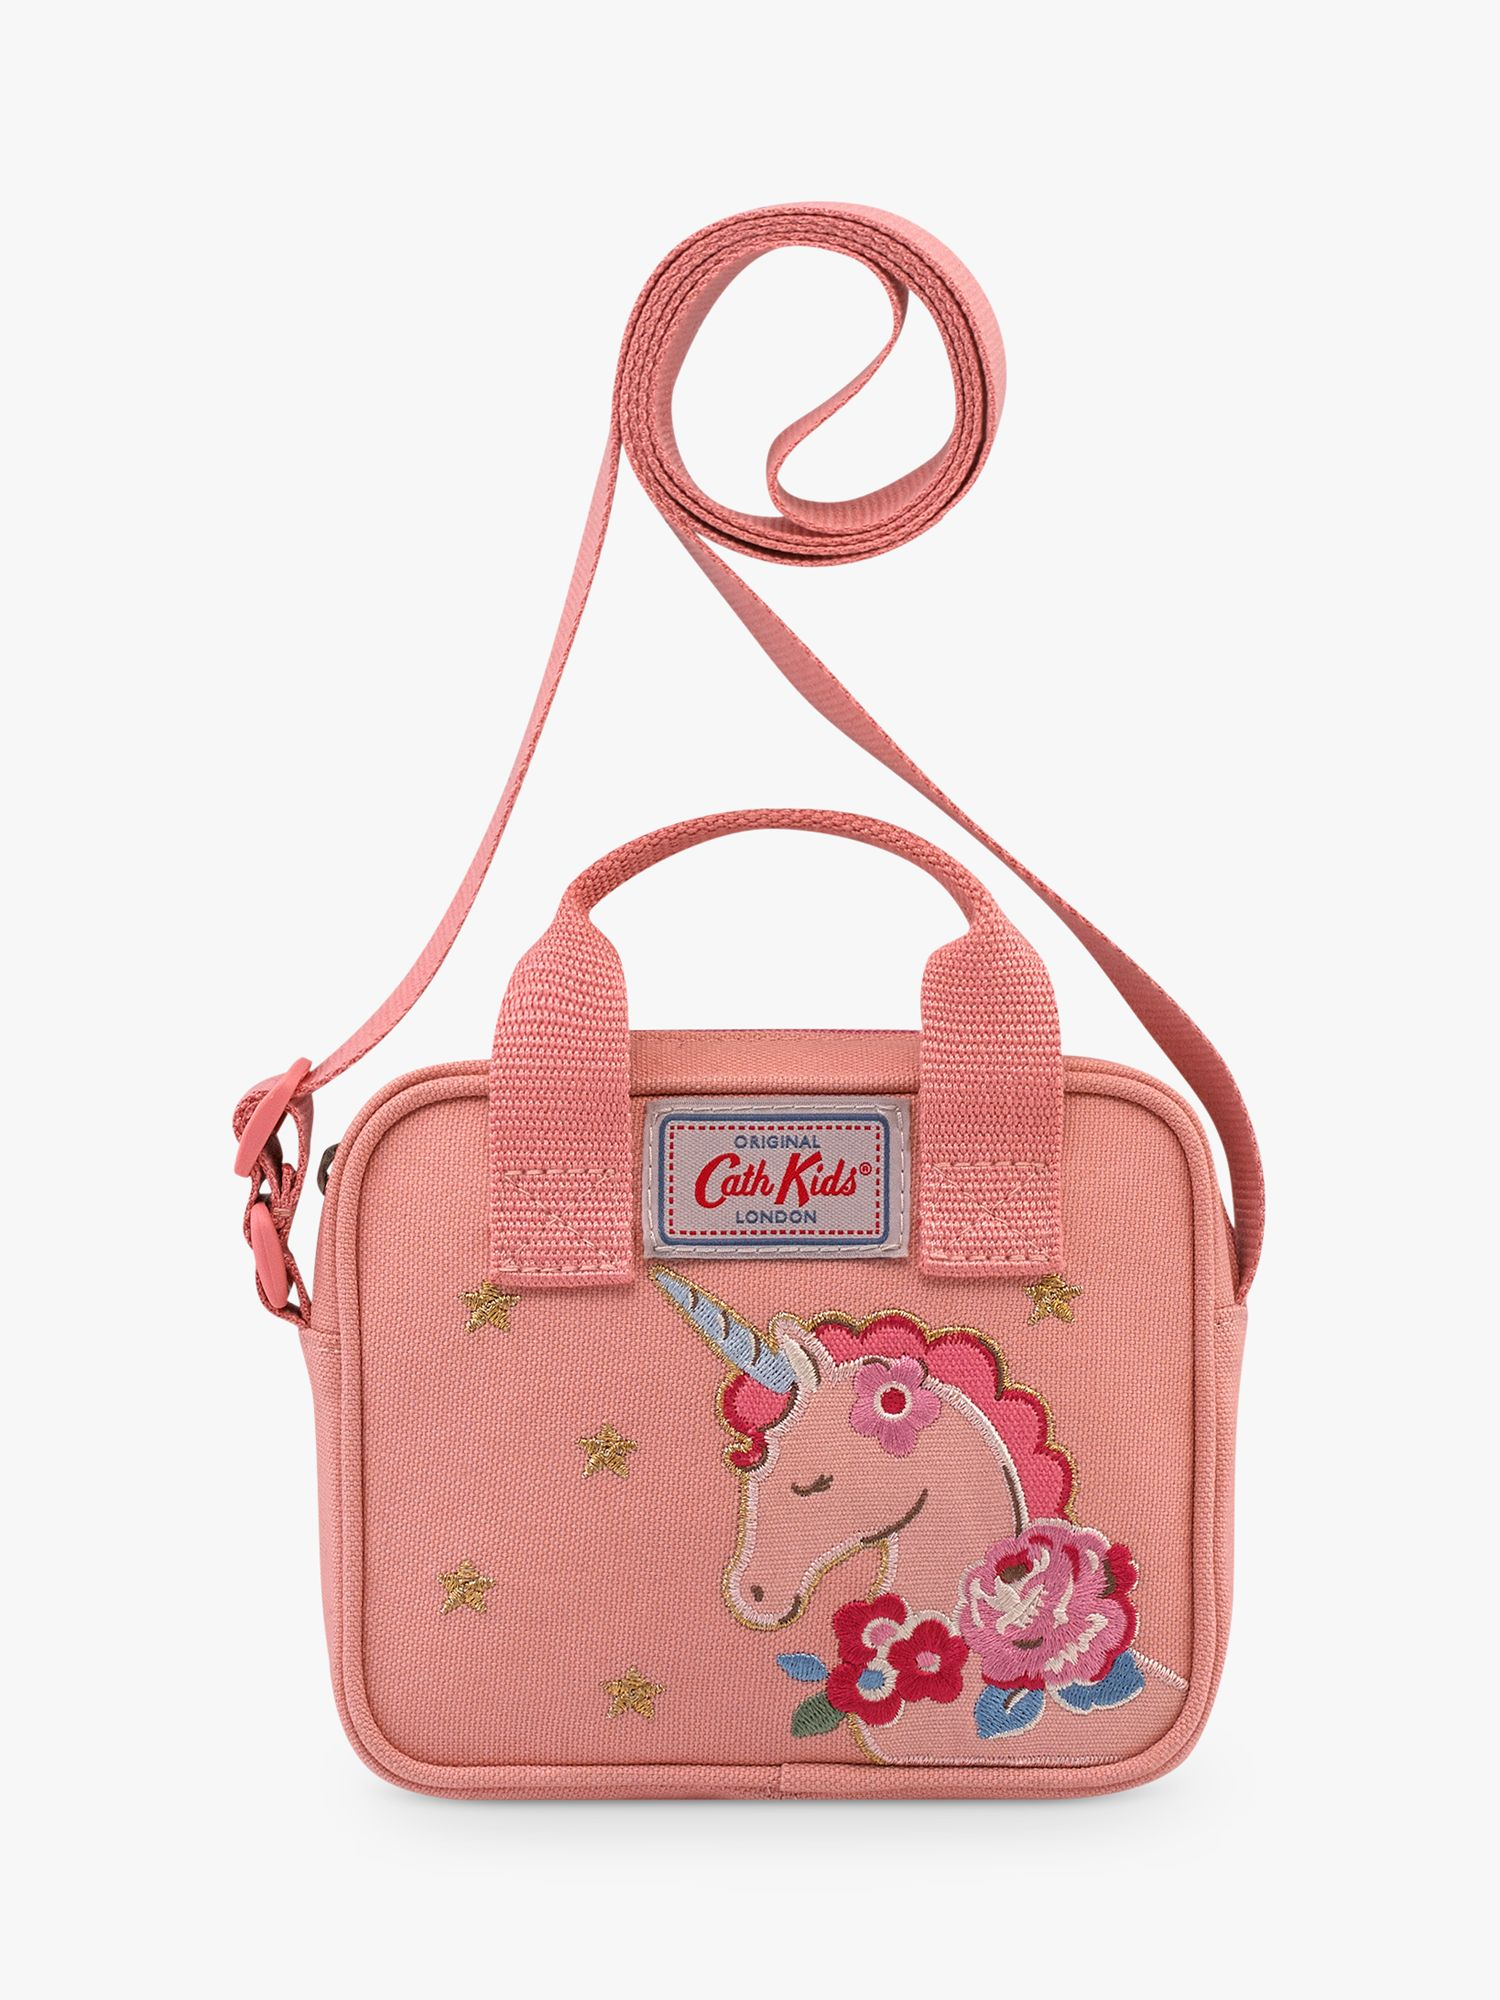 Cath Kidston Cath Kidston Unicorn Meadow Cross Body Handbag, Pink